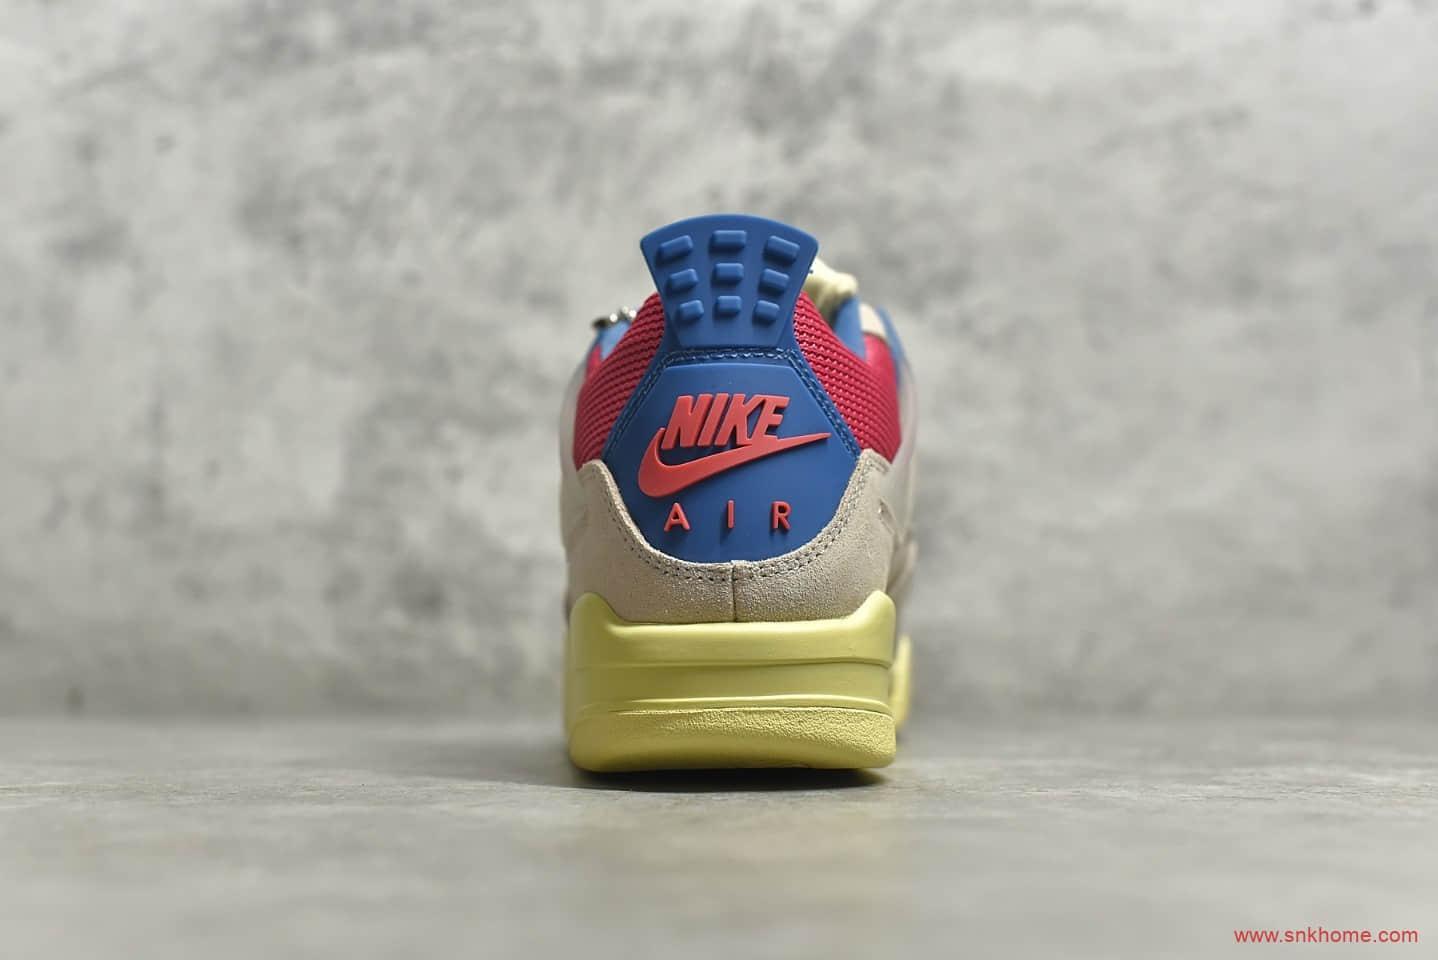 AJ4Union联名粉红蓝配色 Union x Air Jordan 4 AJ4 乔4联名款南海岸粉红蓝篮球鞋 货号:DC9533-800-潮流者之家